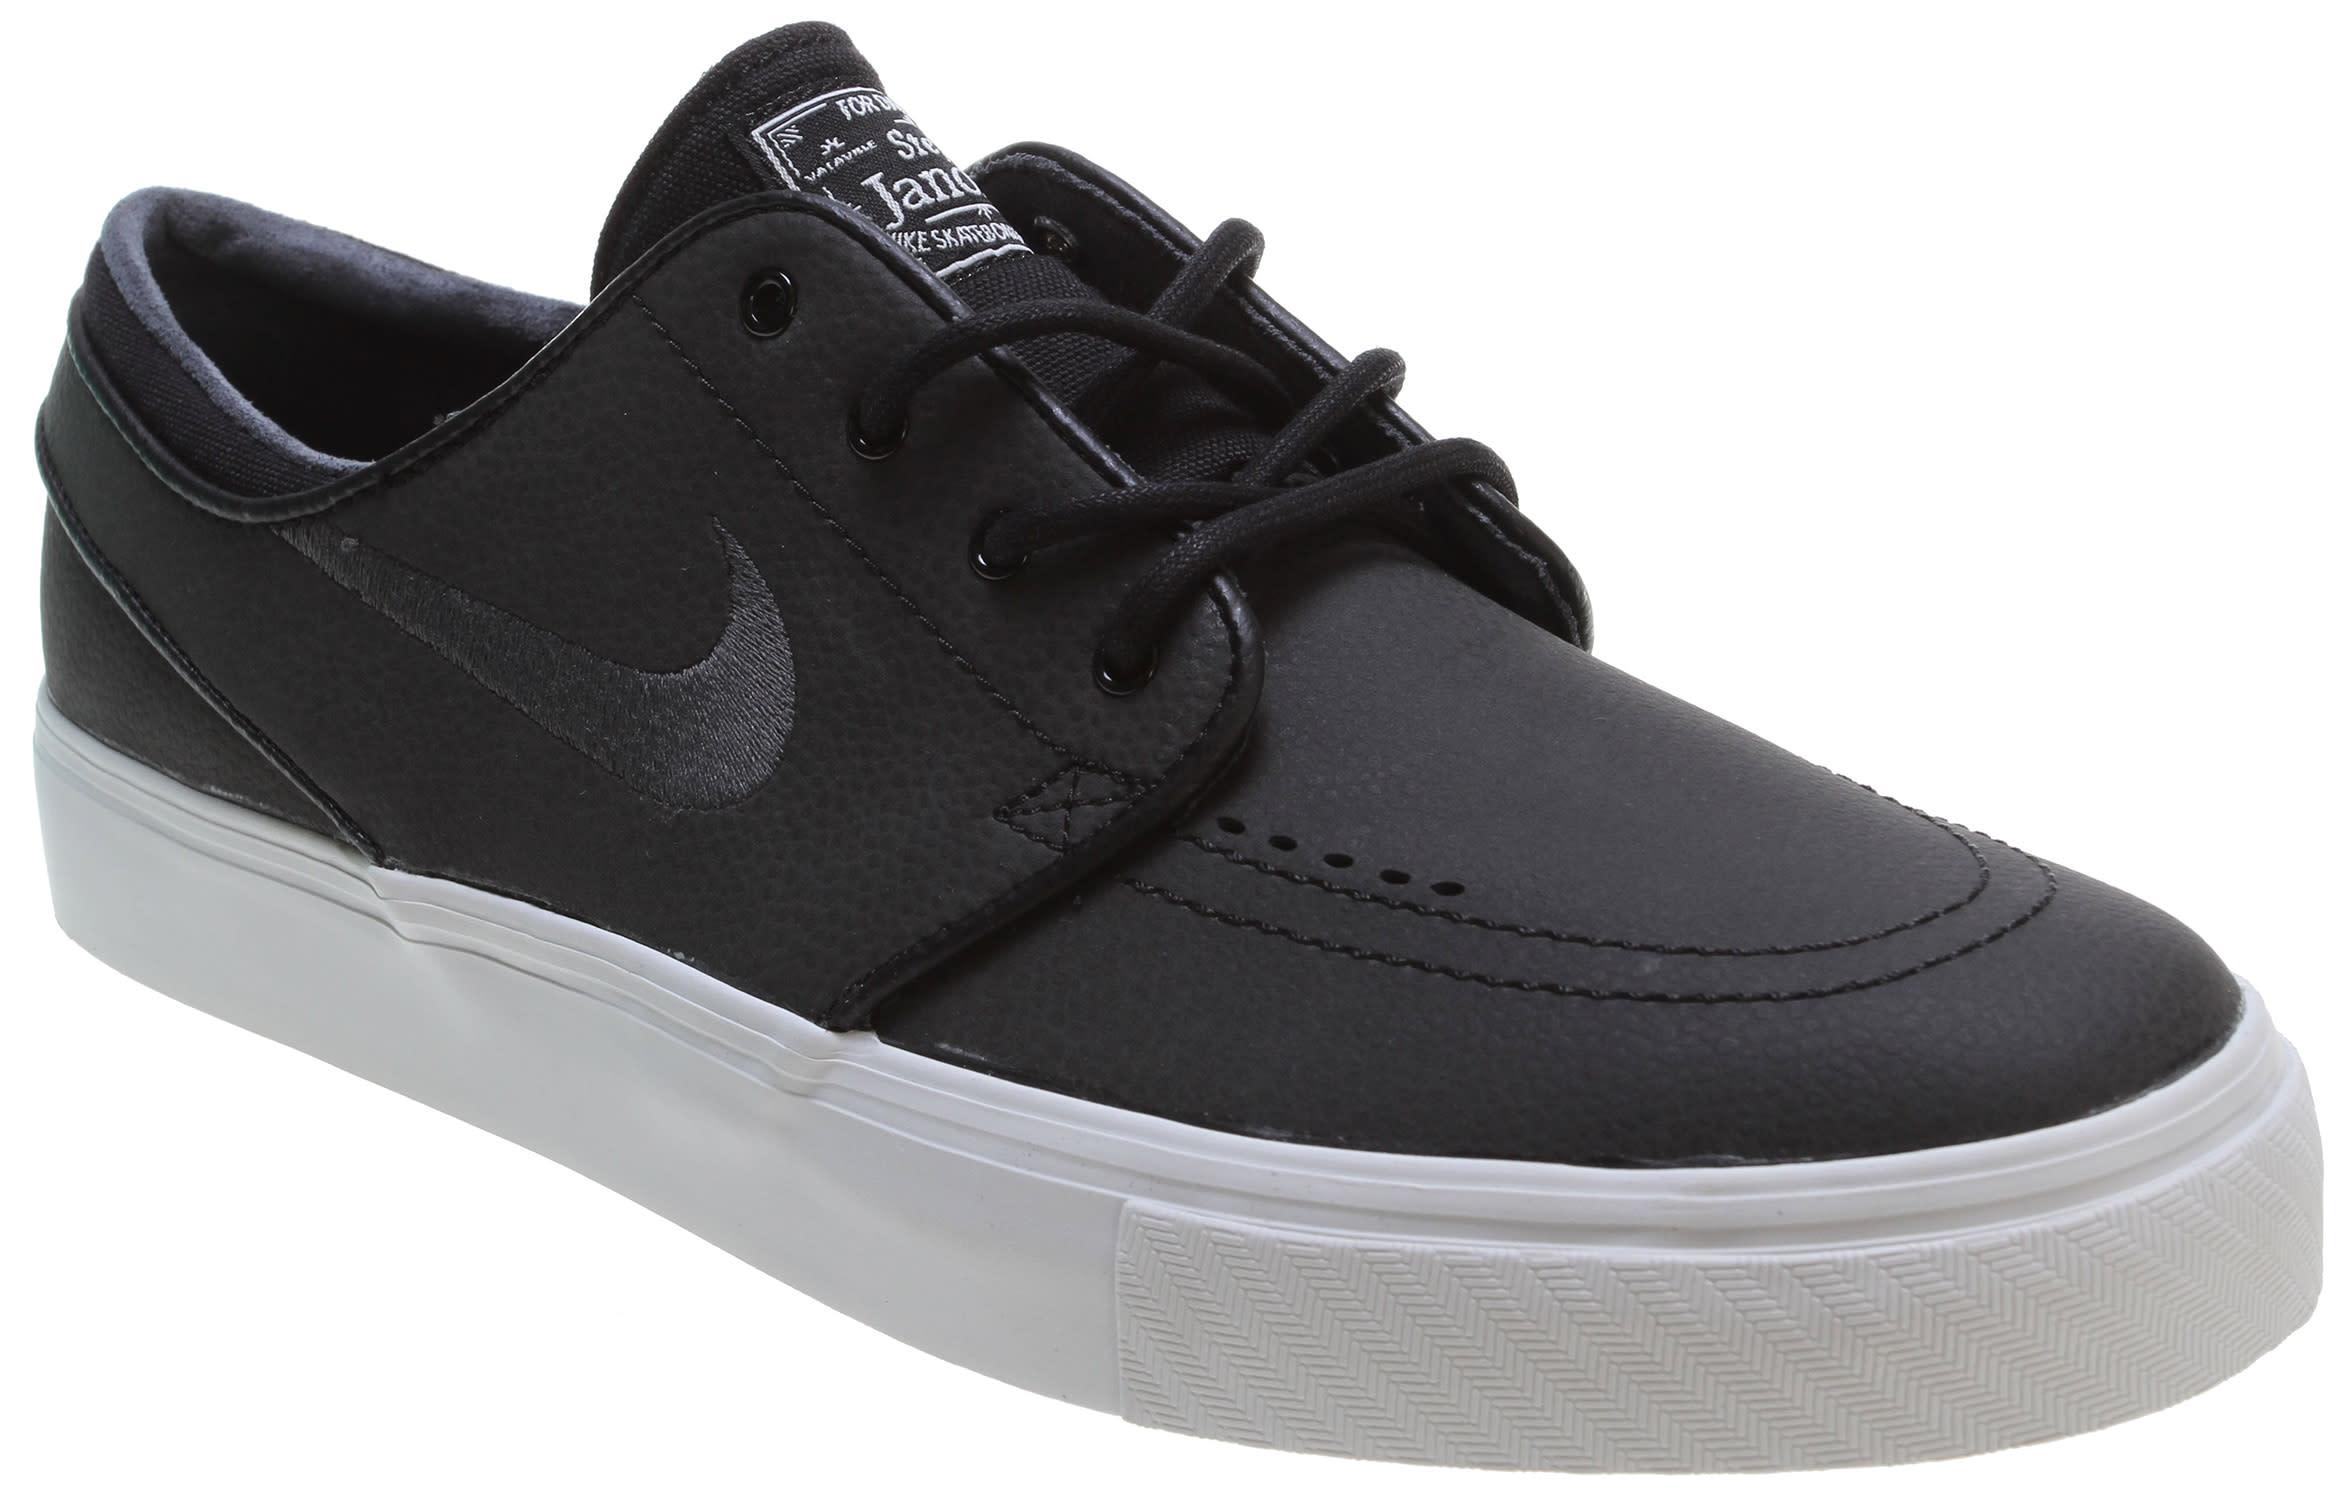 ddb6004fbc39 Nike Zoom Stefan Janoski Leather Shoes - thumbnail 2